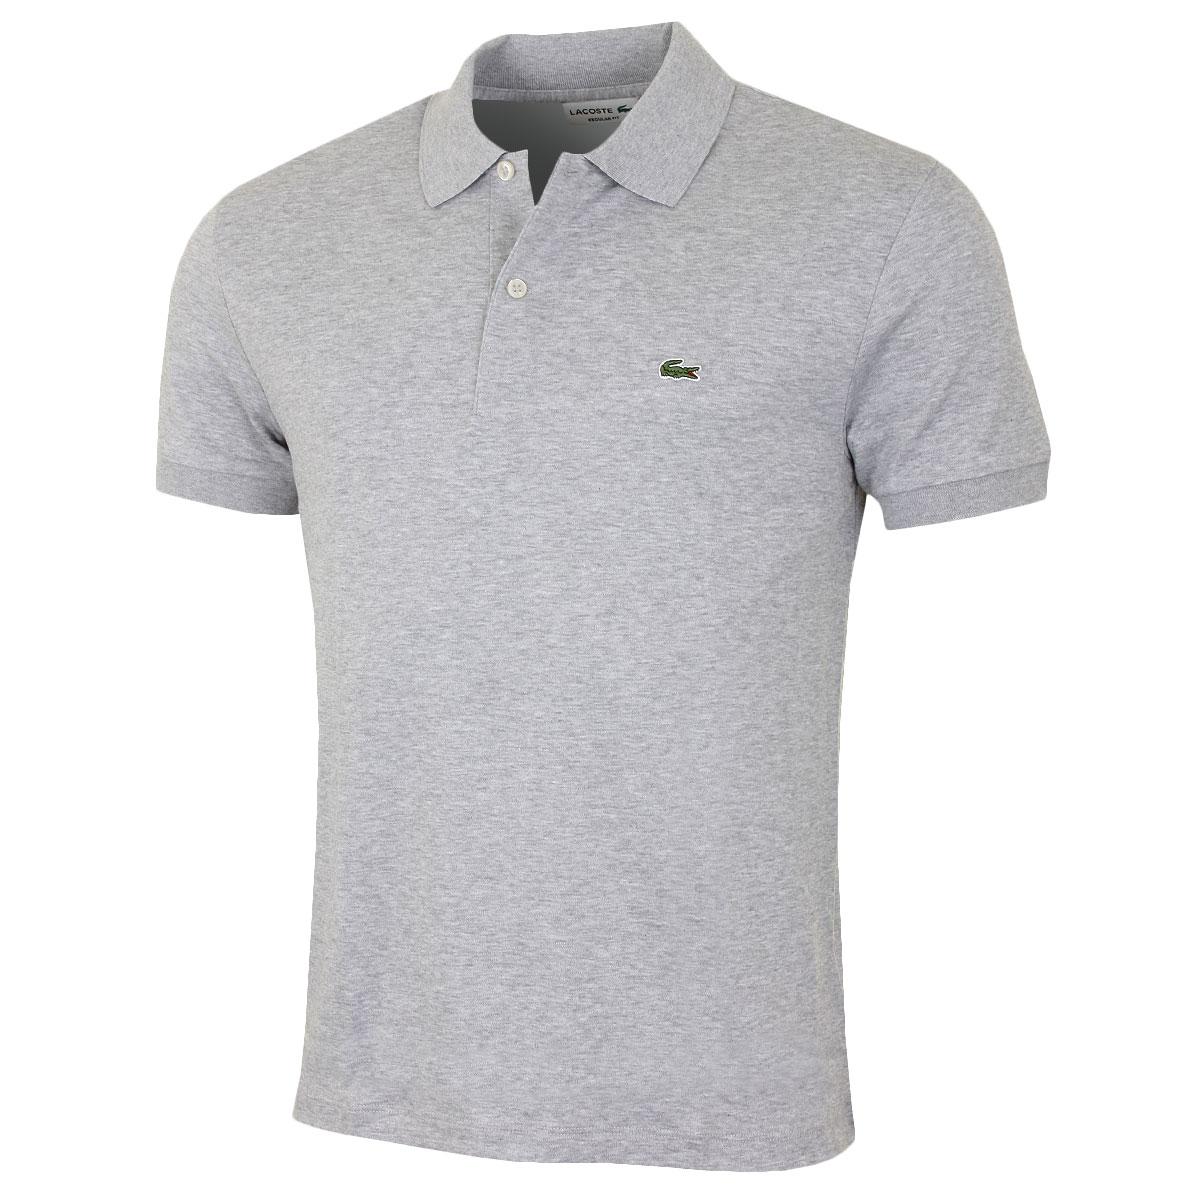 Buy Lacoste Polo Shirt